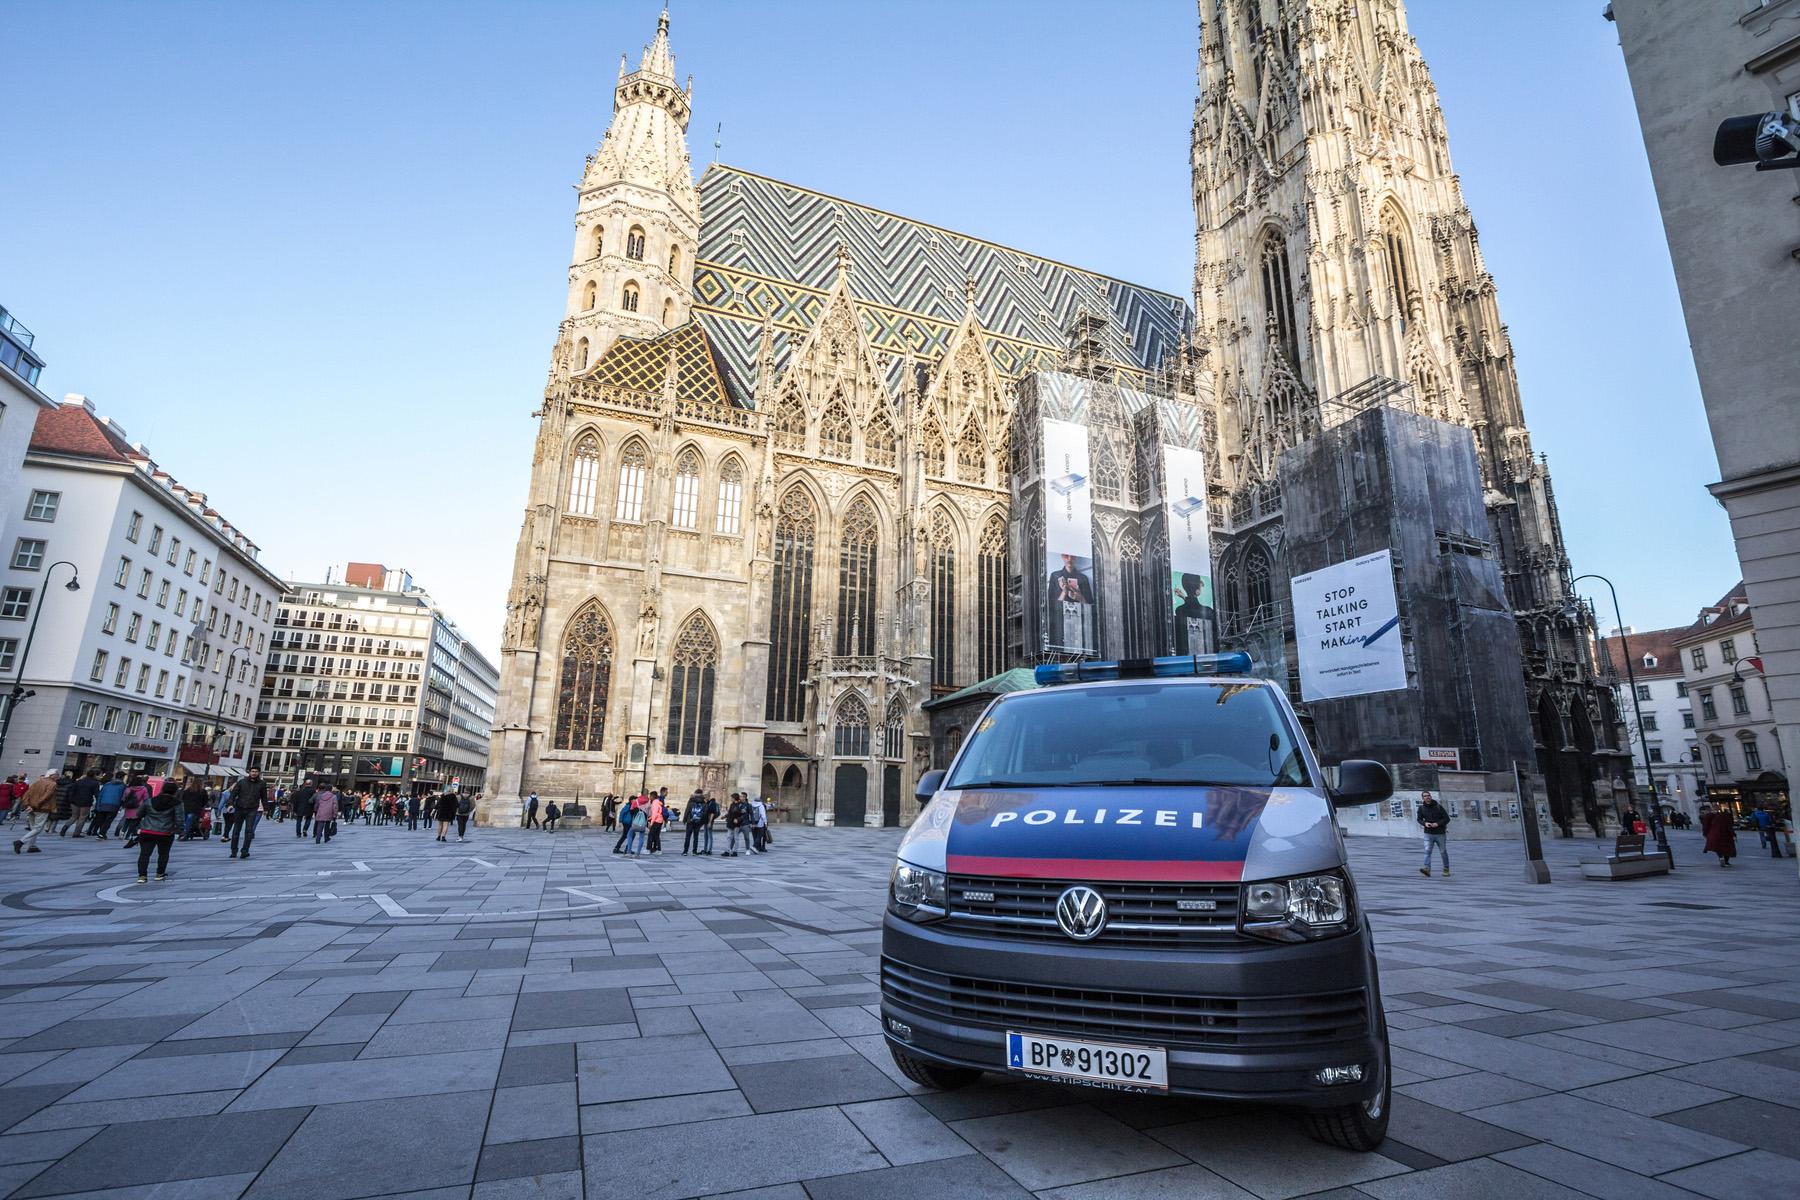 Police car in Vienna